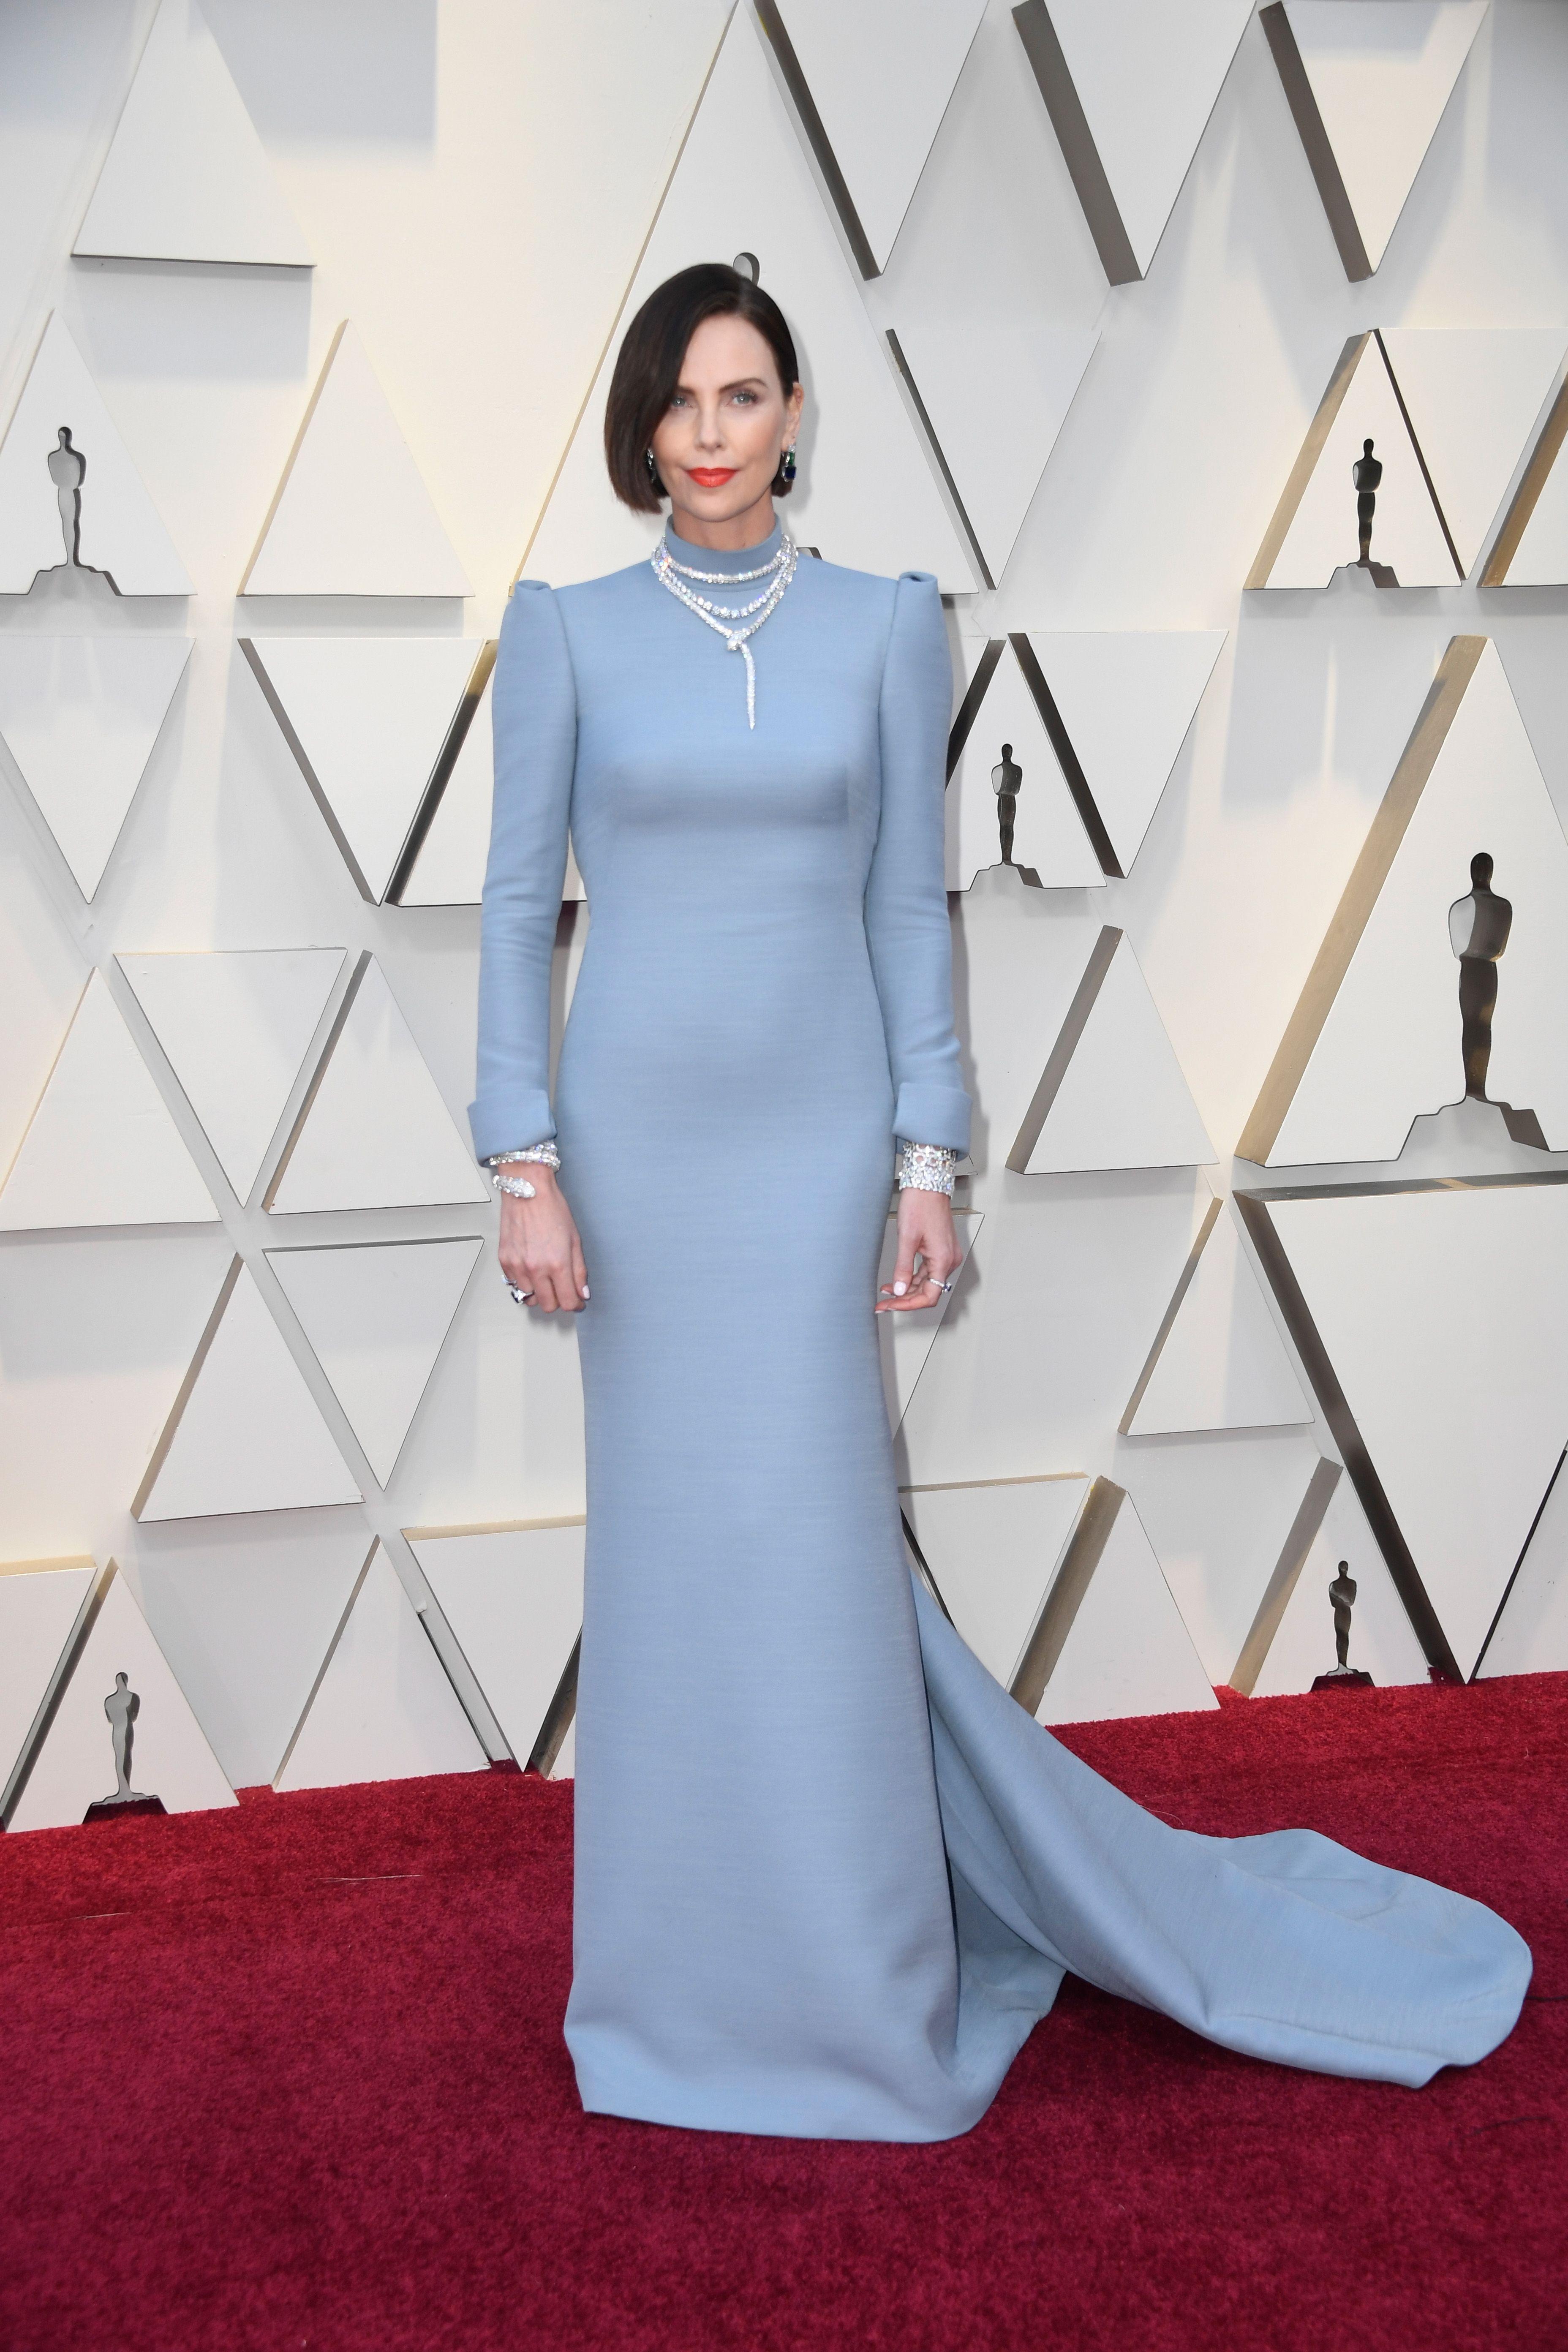 9dae53e1d4 Premios Oscar 2019  looks de la alfombra roja - Vestidos Oscar 2019